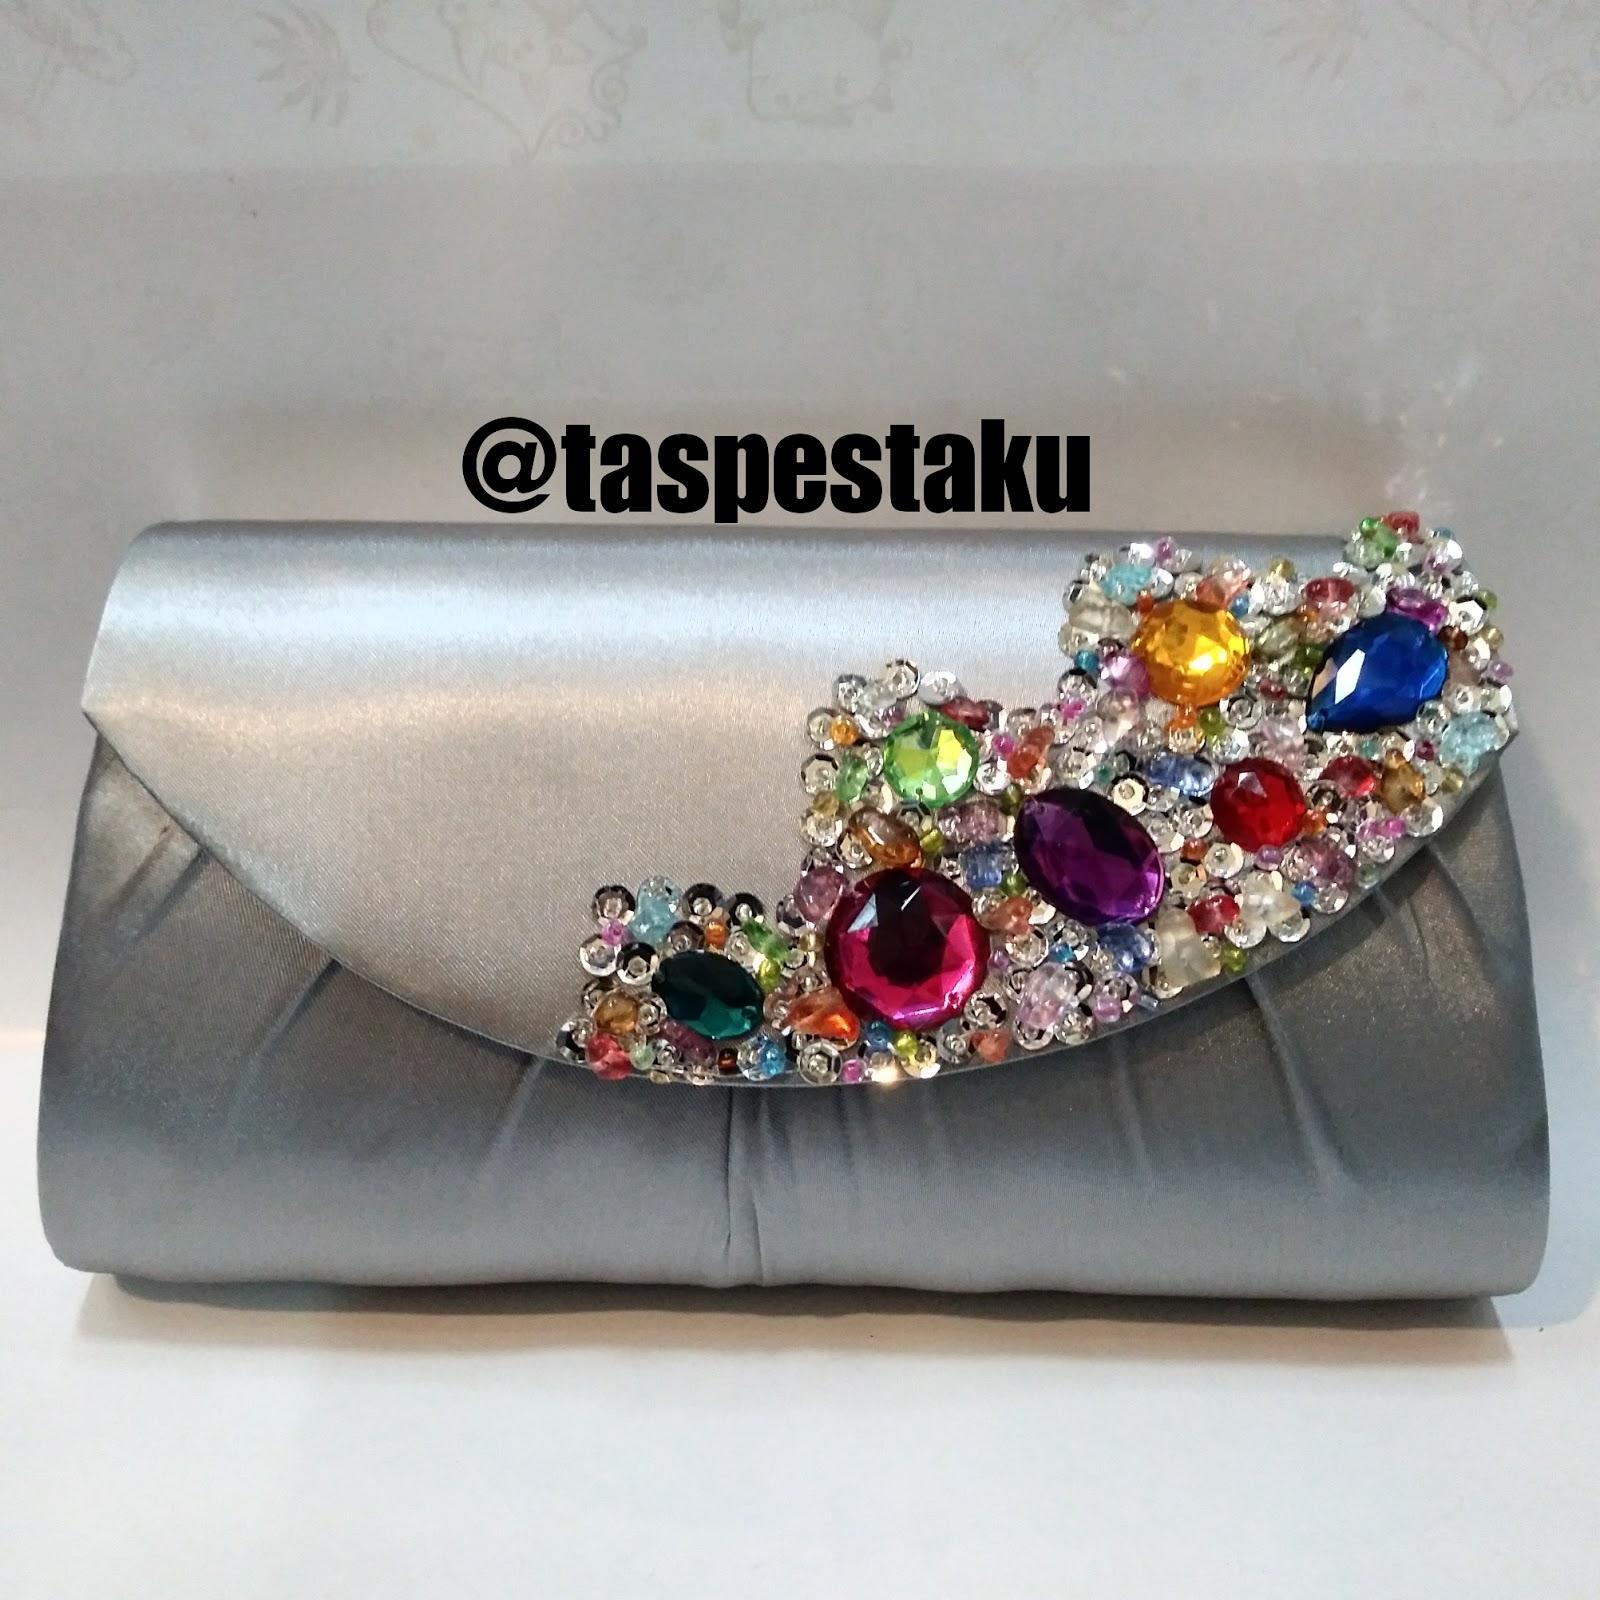 Tas Pesta - Clutch Bag  taspestaku  Ready Stock Tas Pesta Koleksi ... afece5c24a